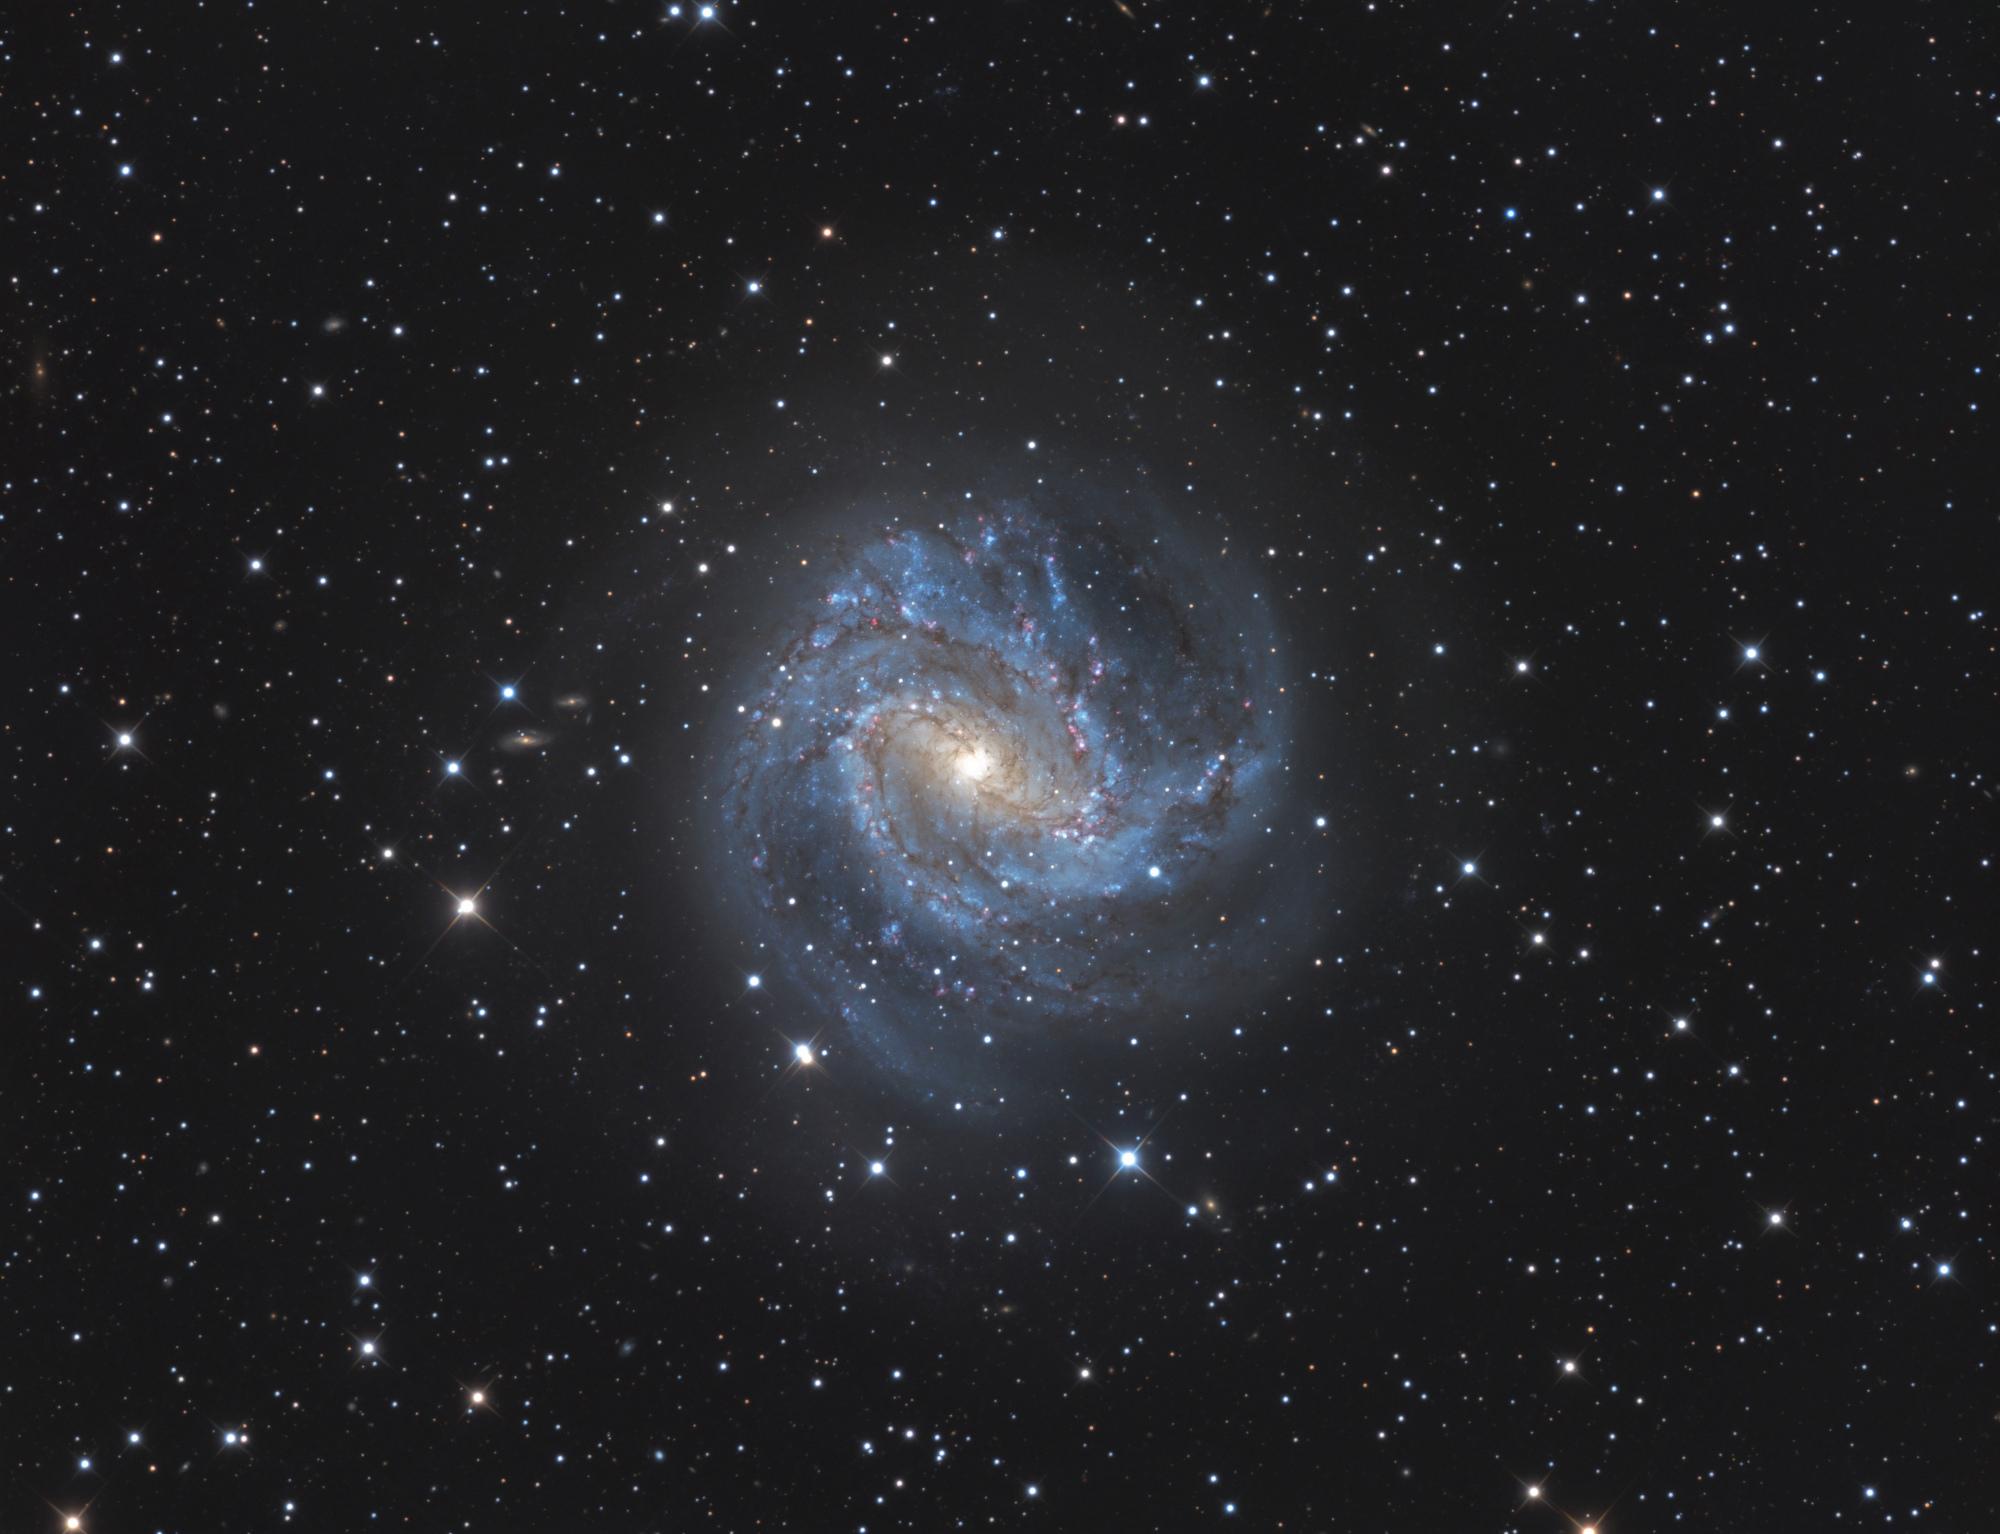 M83-LRVB-V4-Publi.thumb.jpg.fd9f5f9d27a41d99636a6395a7107658.jpg